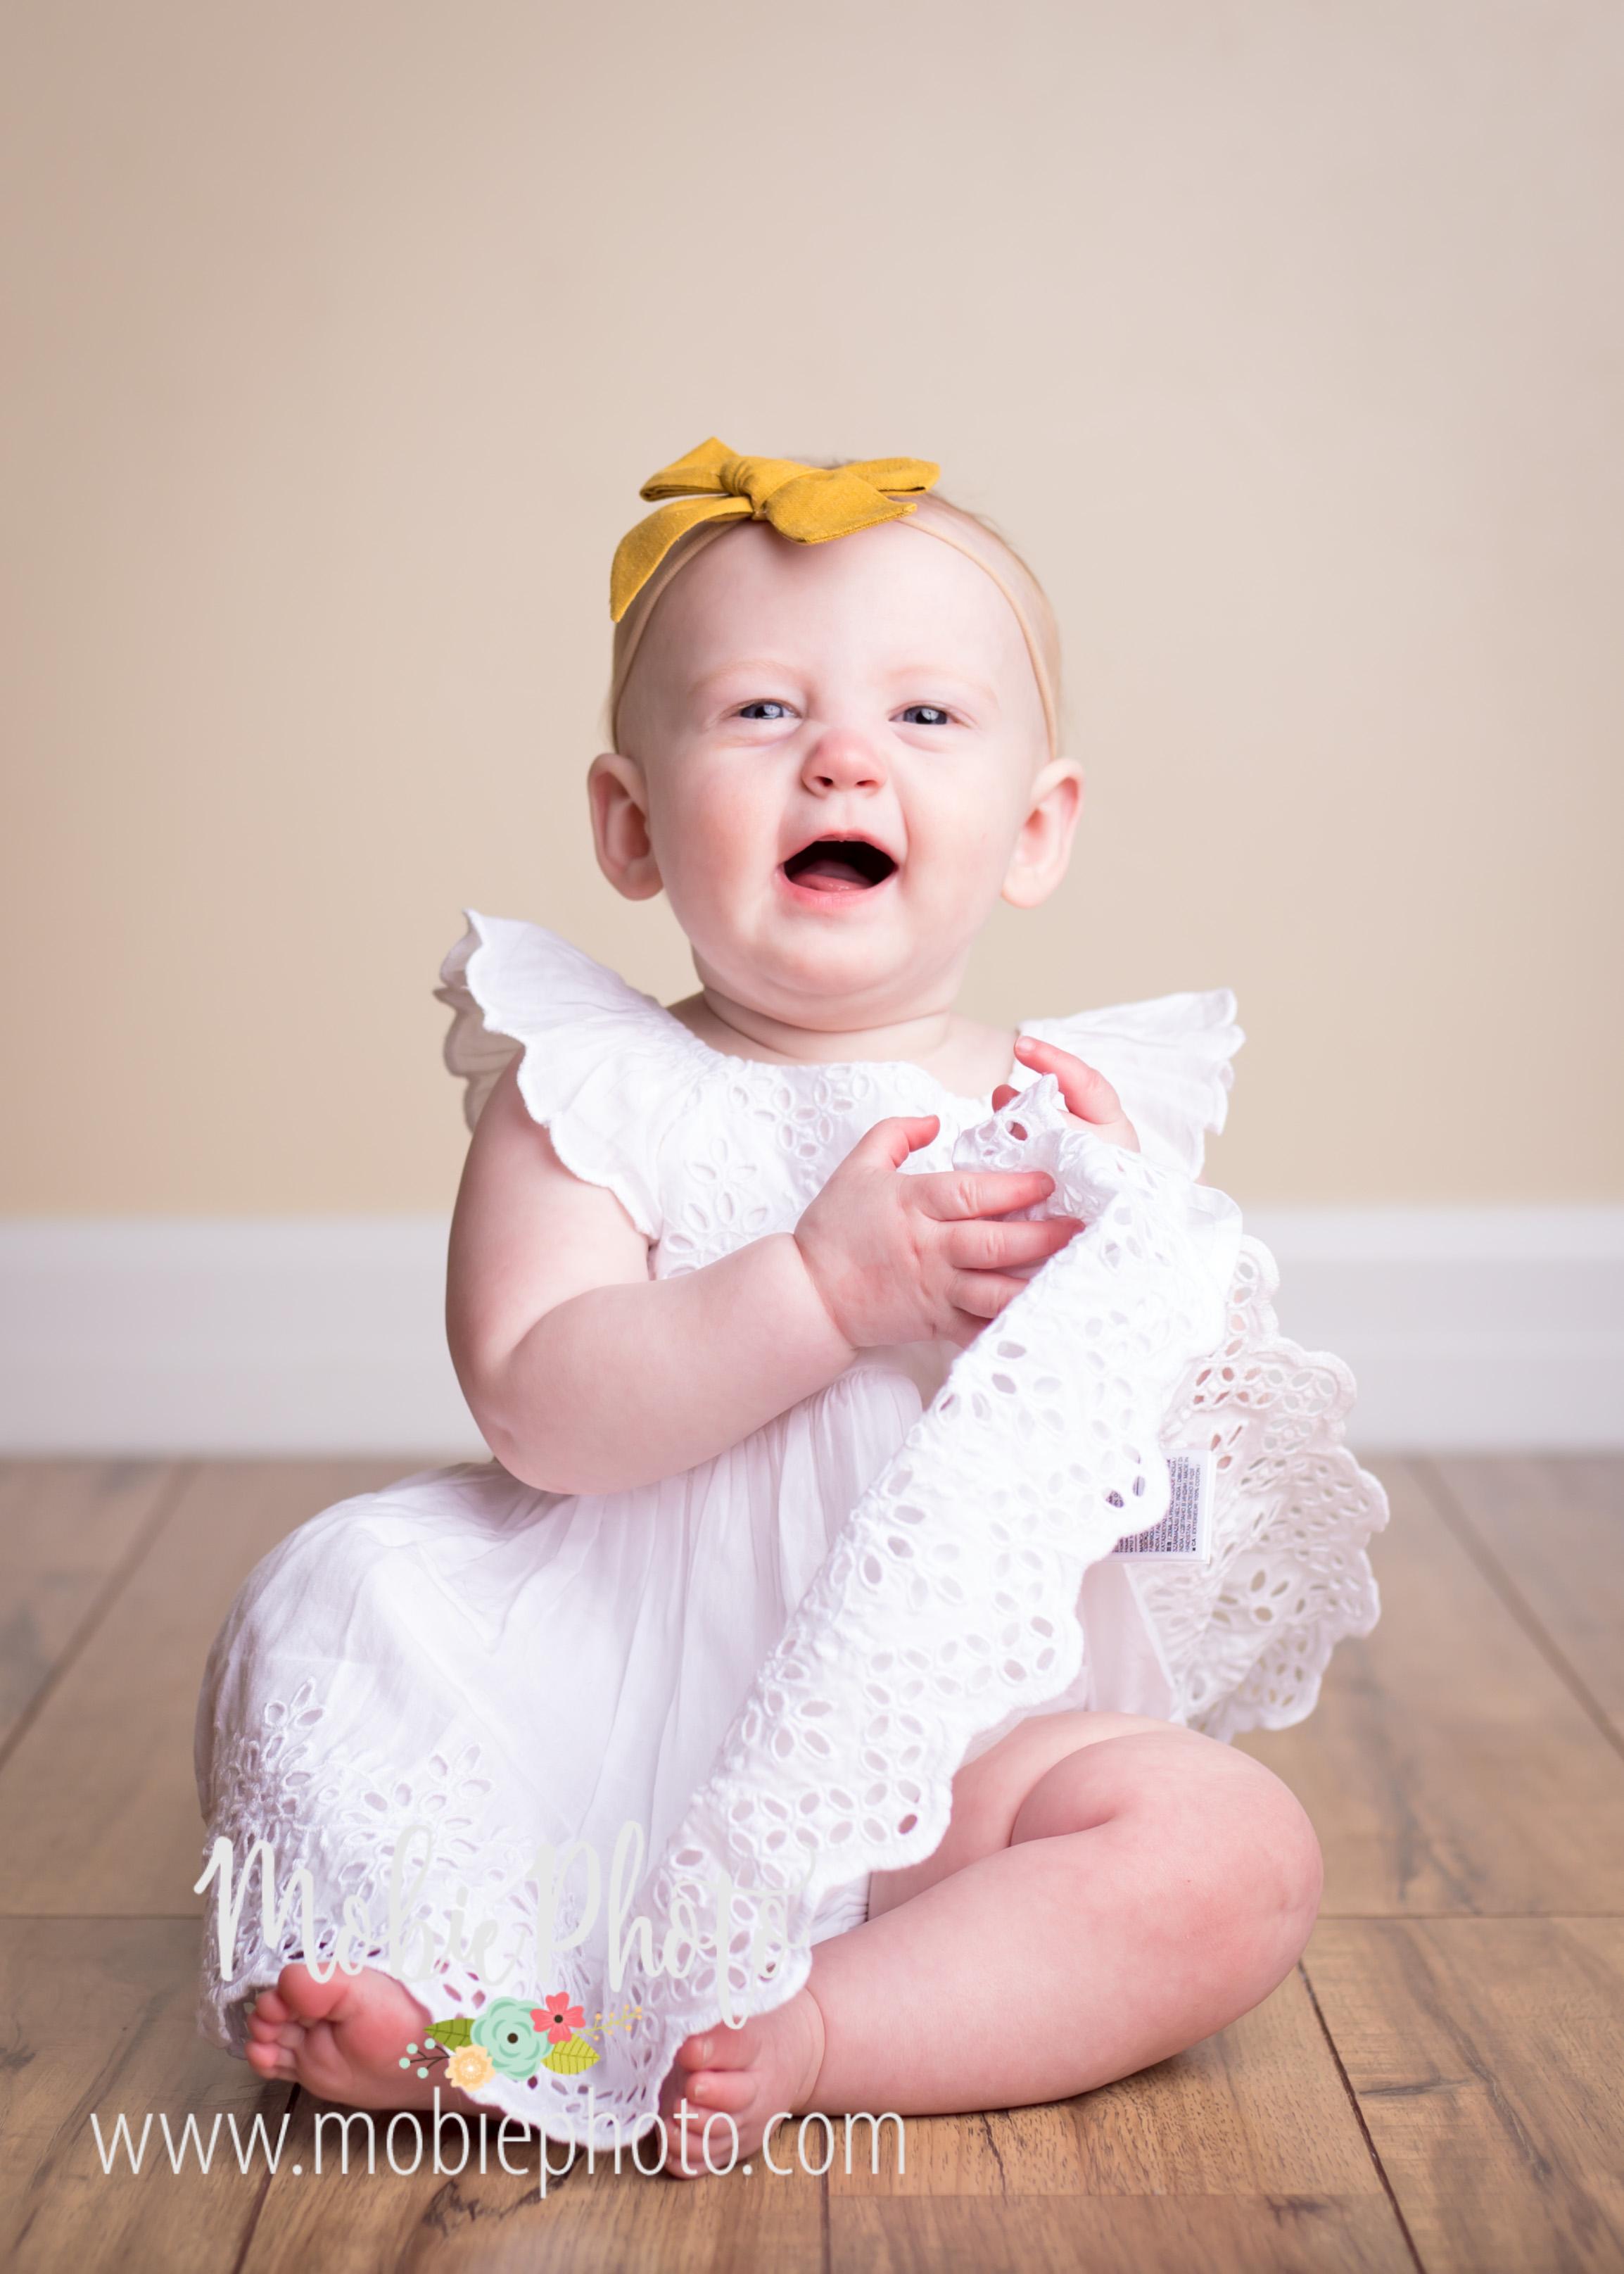 Mobie Photo - Utah Baby Photographer - 8 month photo shoot